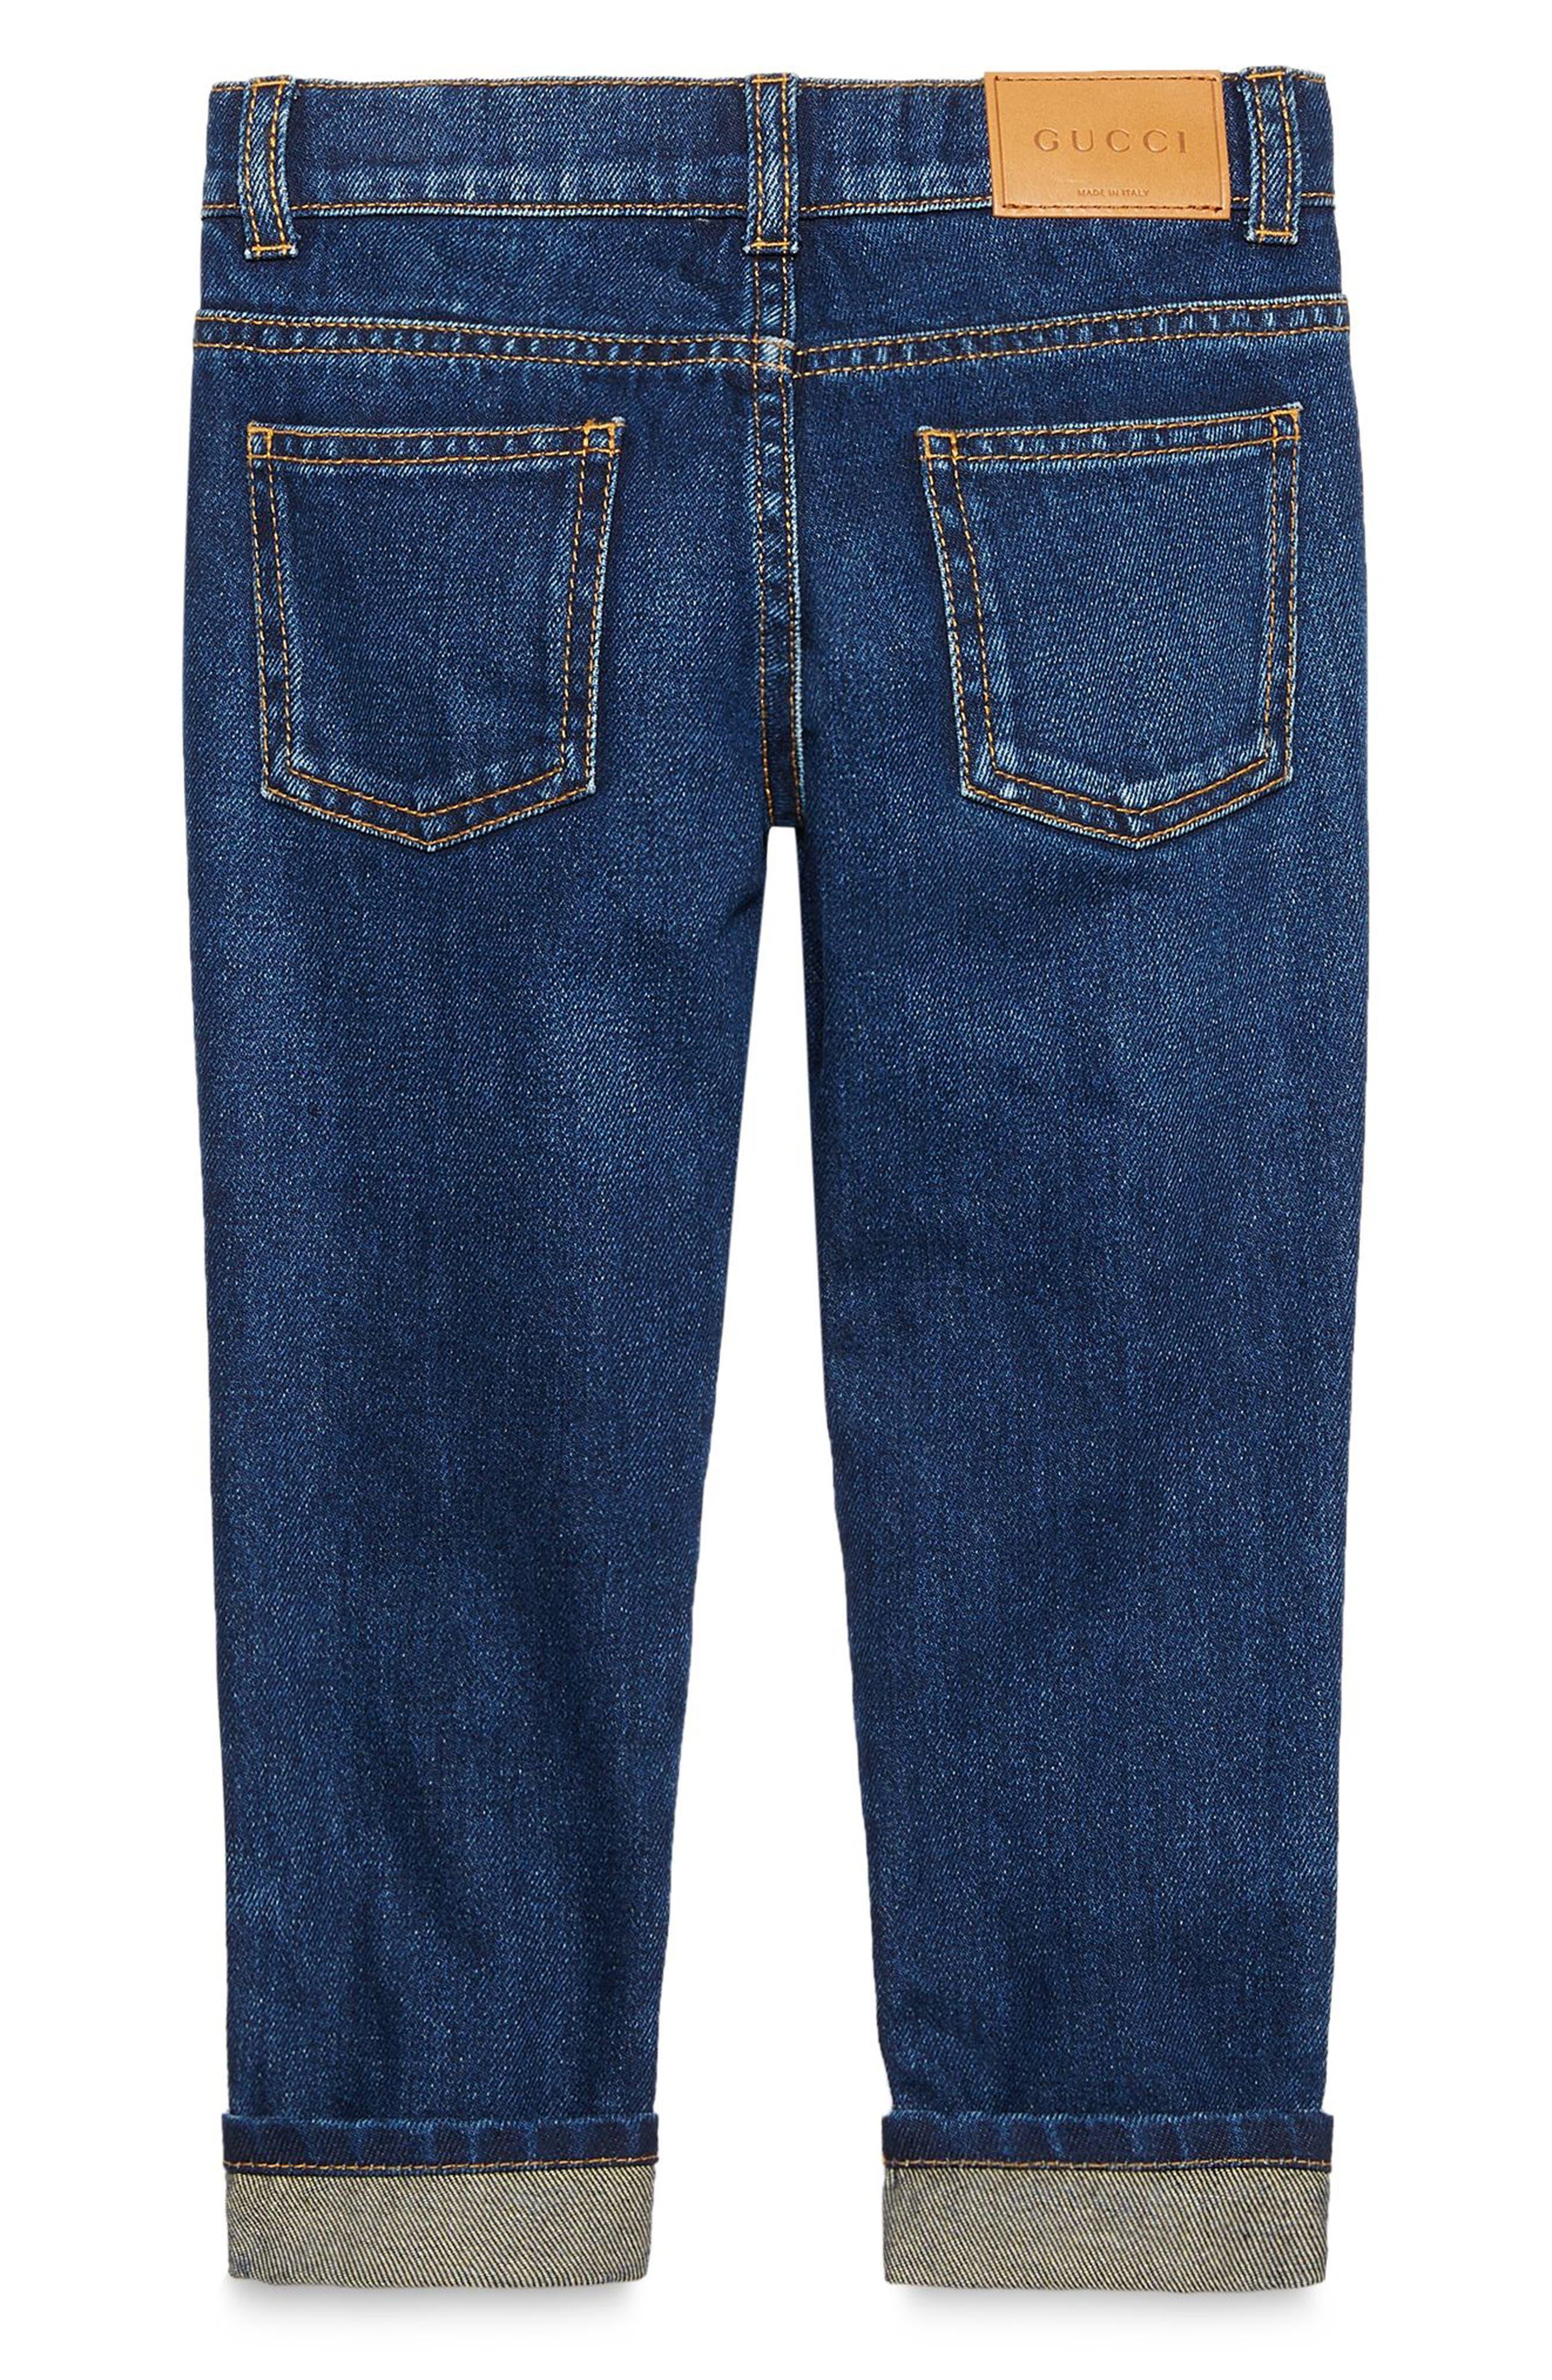 Cuffed Jeans,                             Alternate thumbnail 2, color,                             ORBIT MULTI